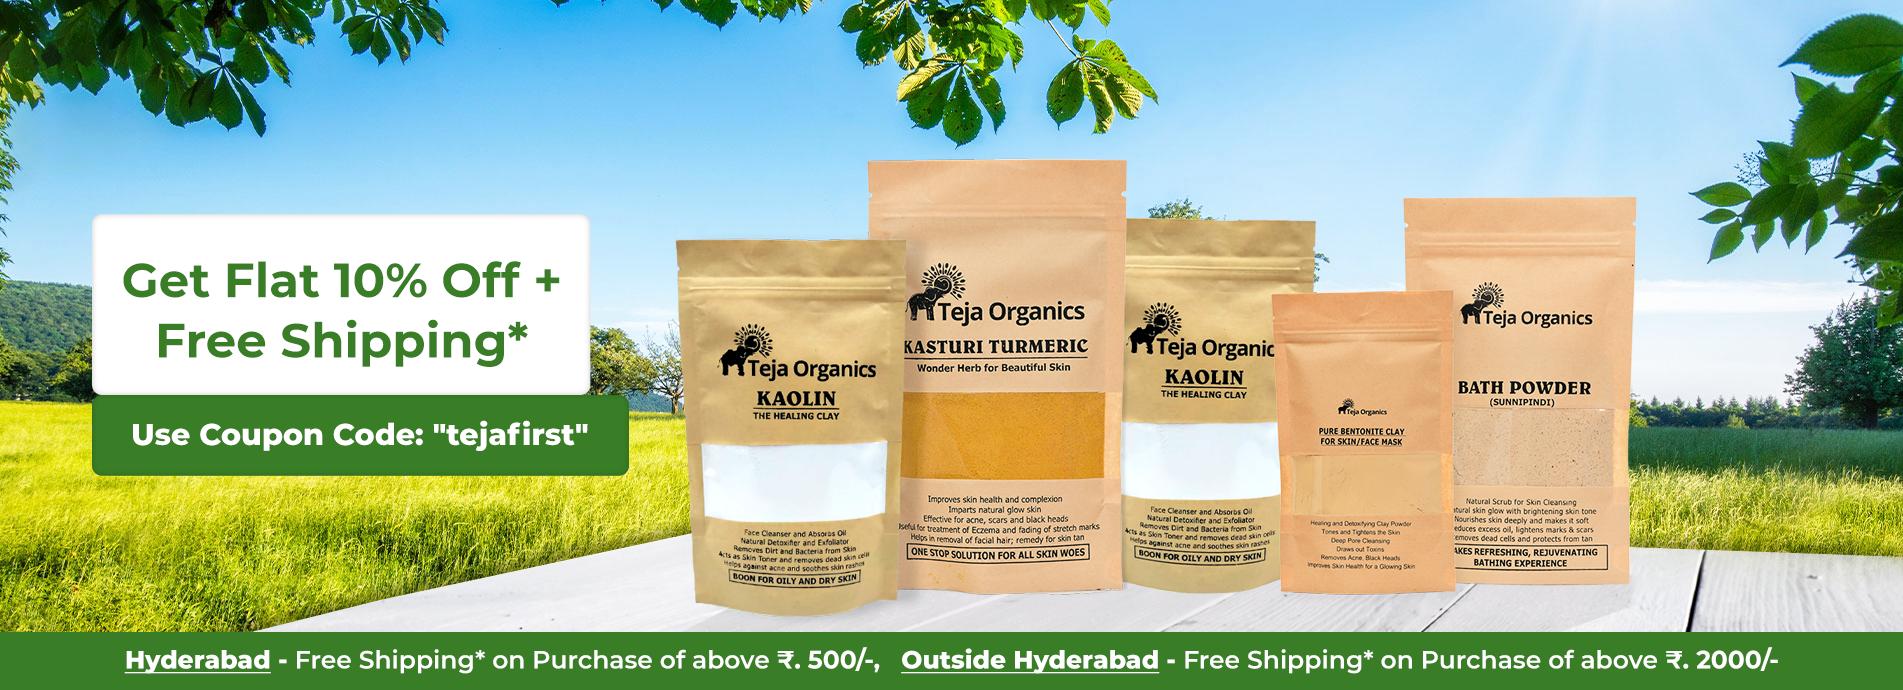 Teja Organics - Skin & Face Care